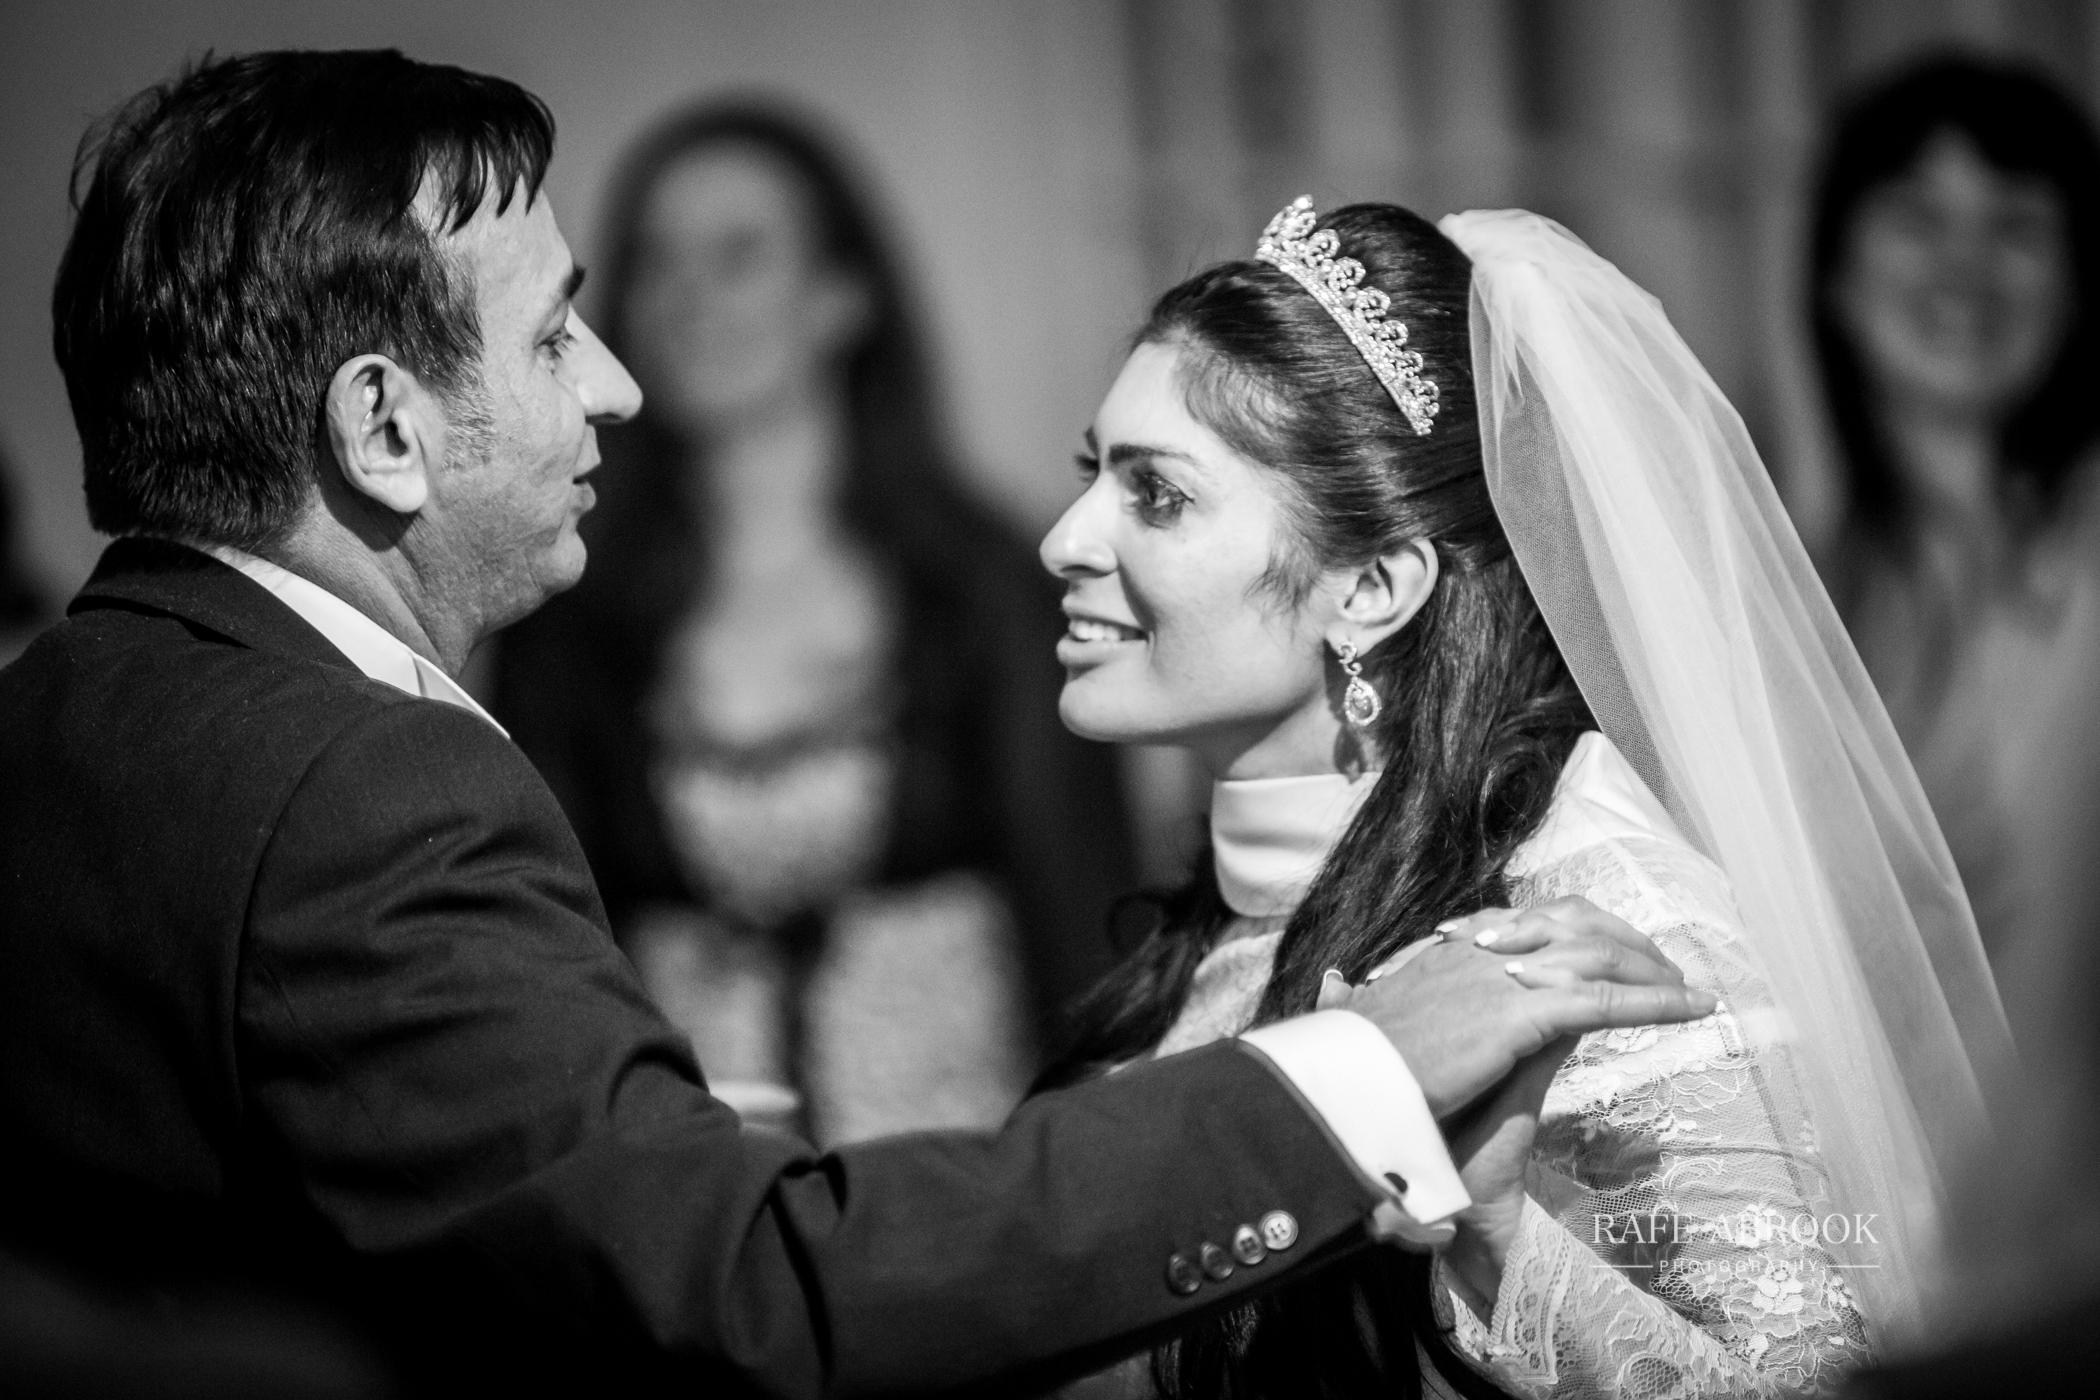 roma & pete wedding hampstead shenley hertfordshire -598.jpg